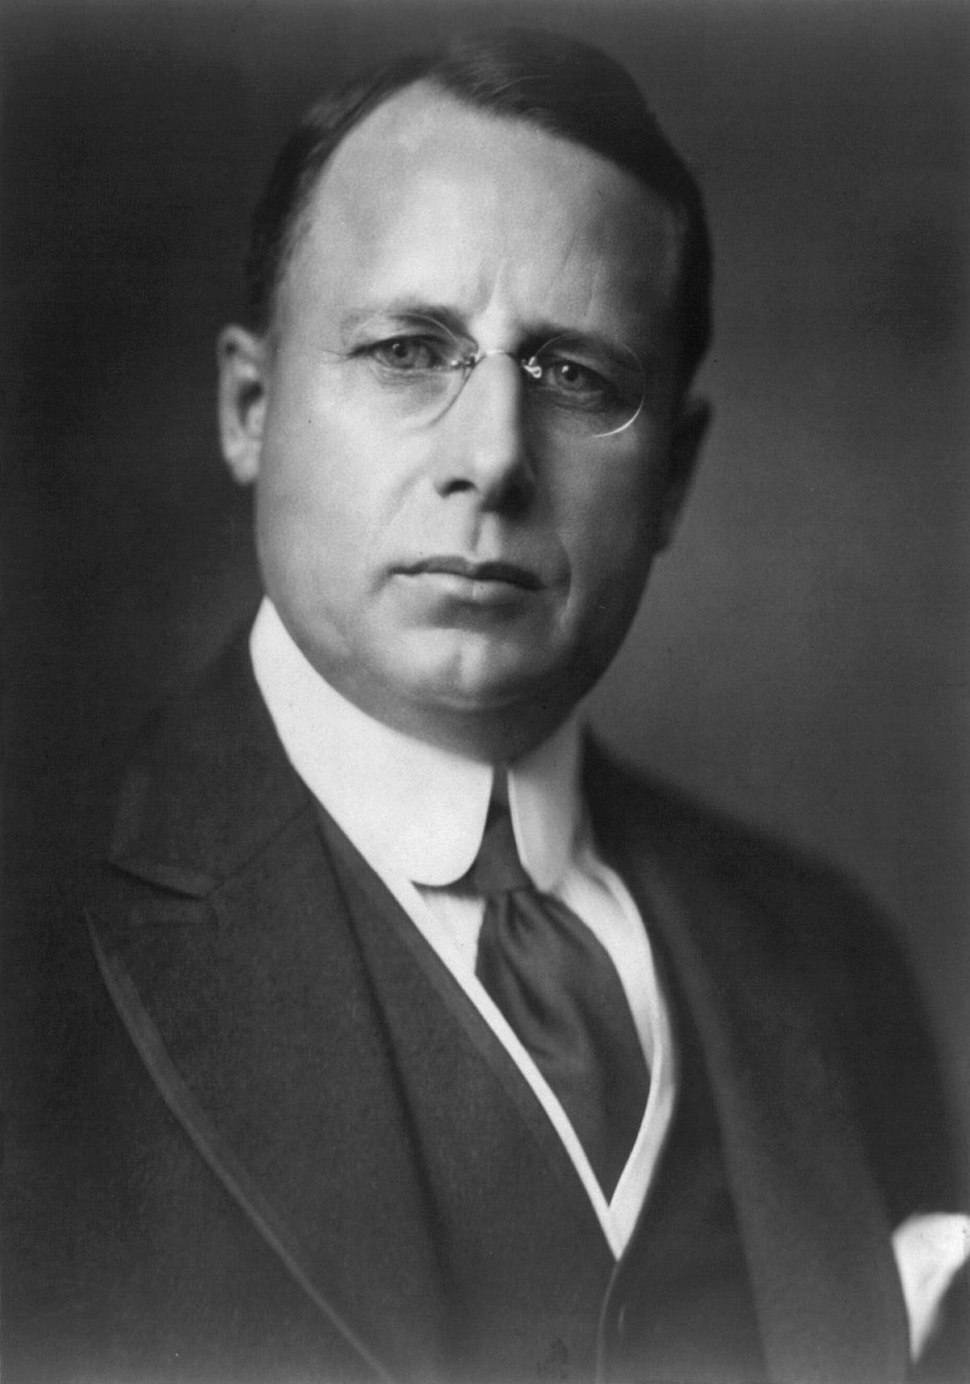 James M. Cox 1920